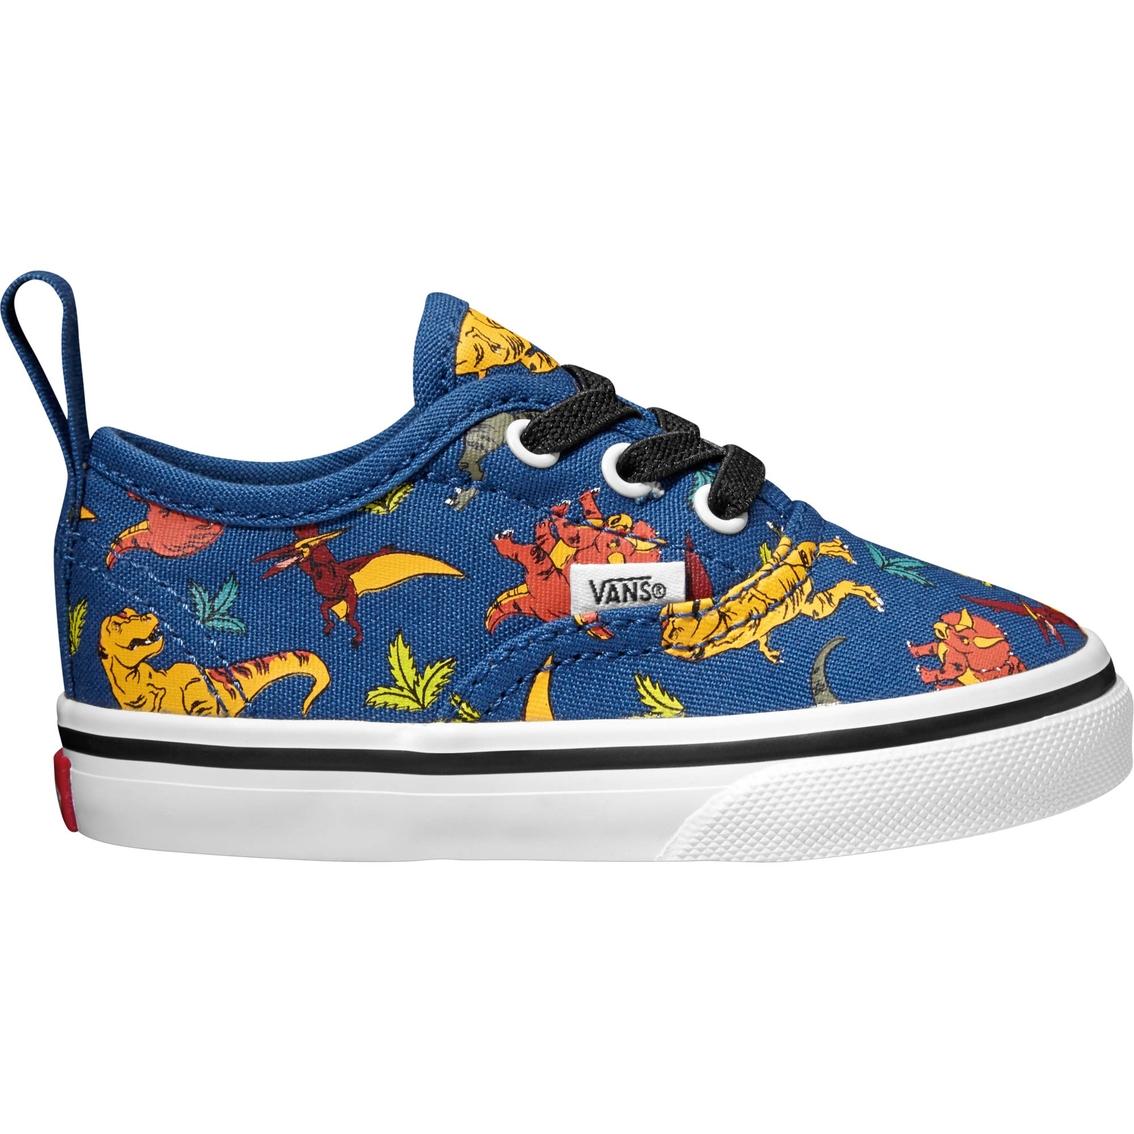 8e5c36e93f444 Vans Little Boys Authentic Dino Elace Sneakers   Casual   Shoes ...